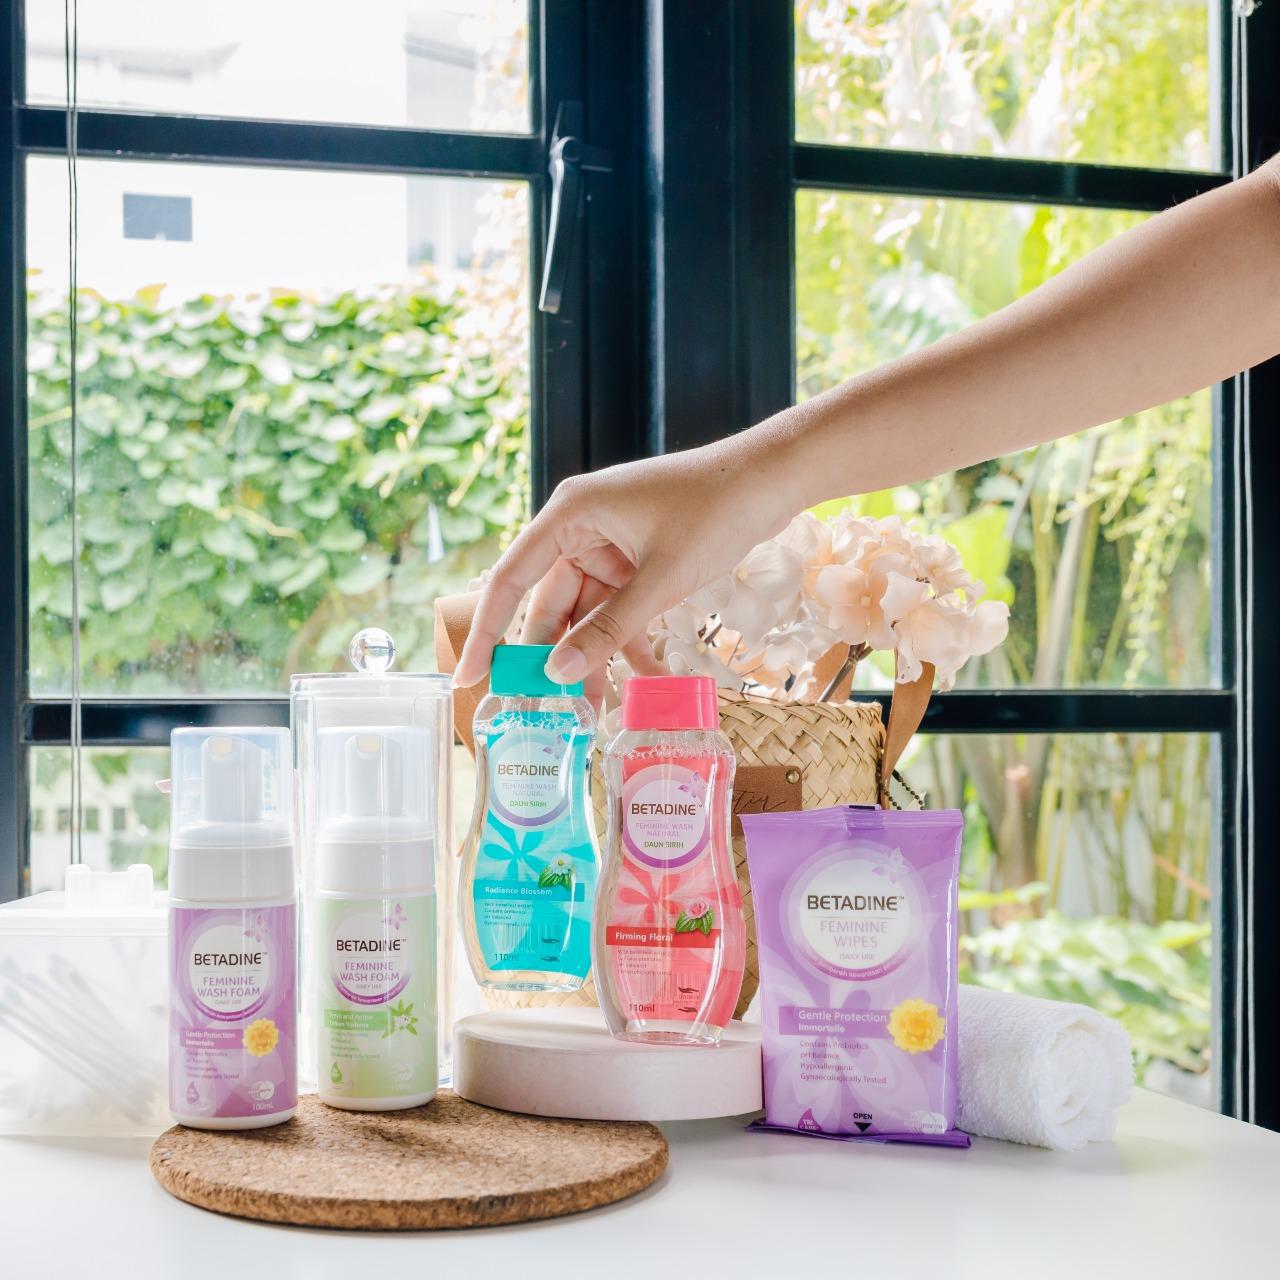 betadine-hygiene-menstrual